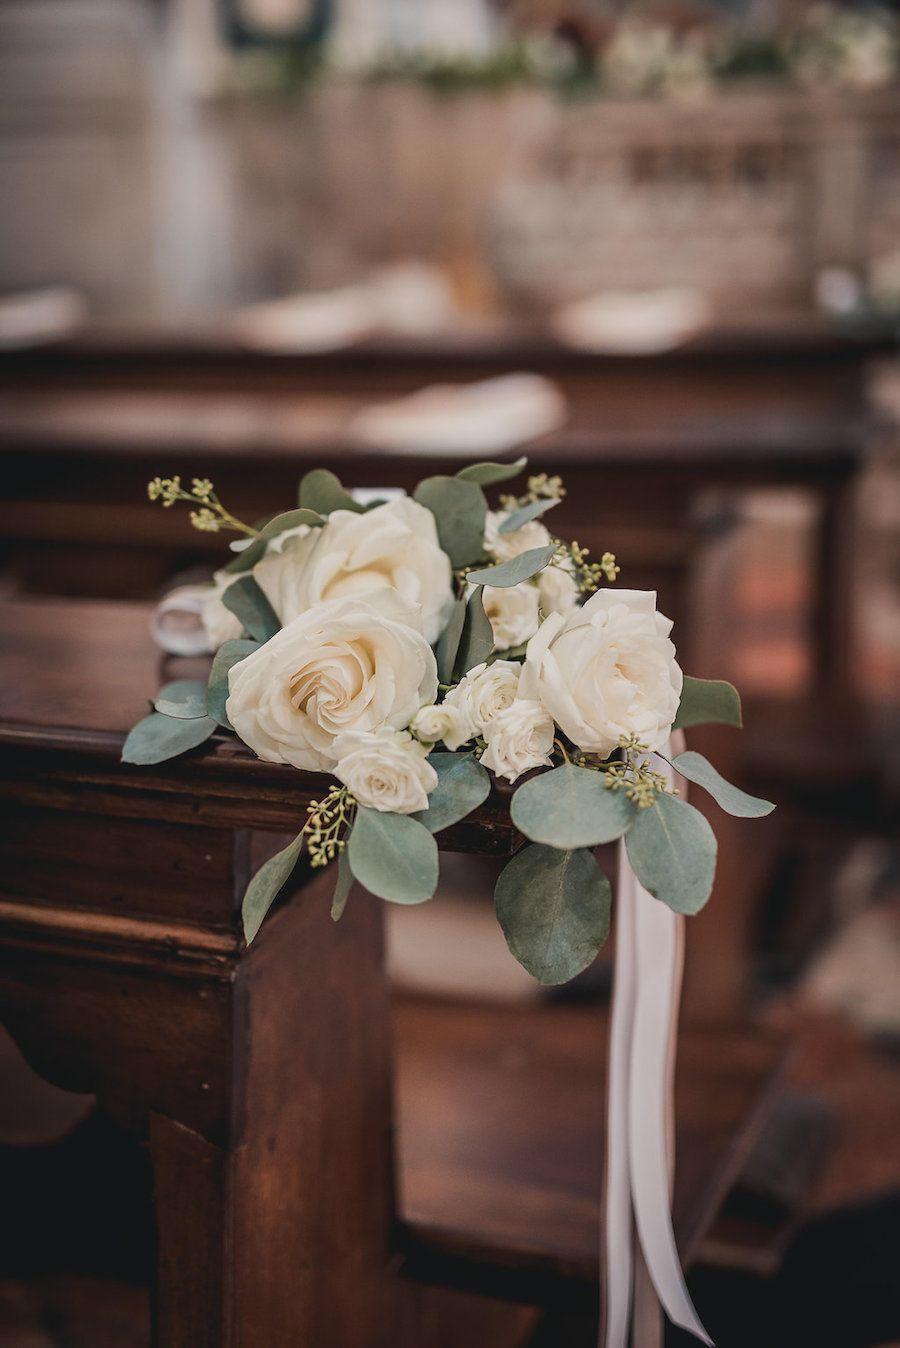 Un Matrimonio Ispirato Ai Viaggi A Venezia Wedding Wonderland Composizioni Floreali Matrimonio Matrimonio Cerimonie Matrimoniali